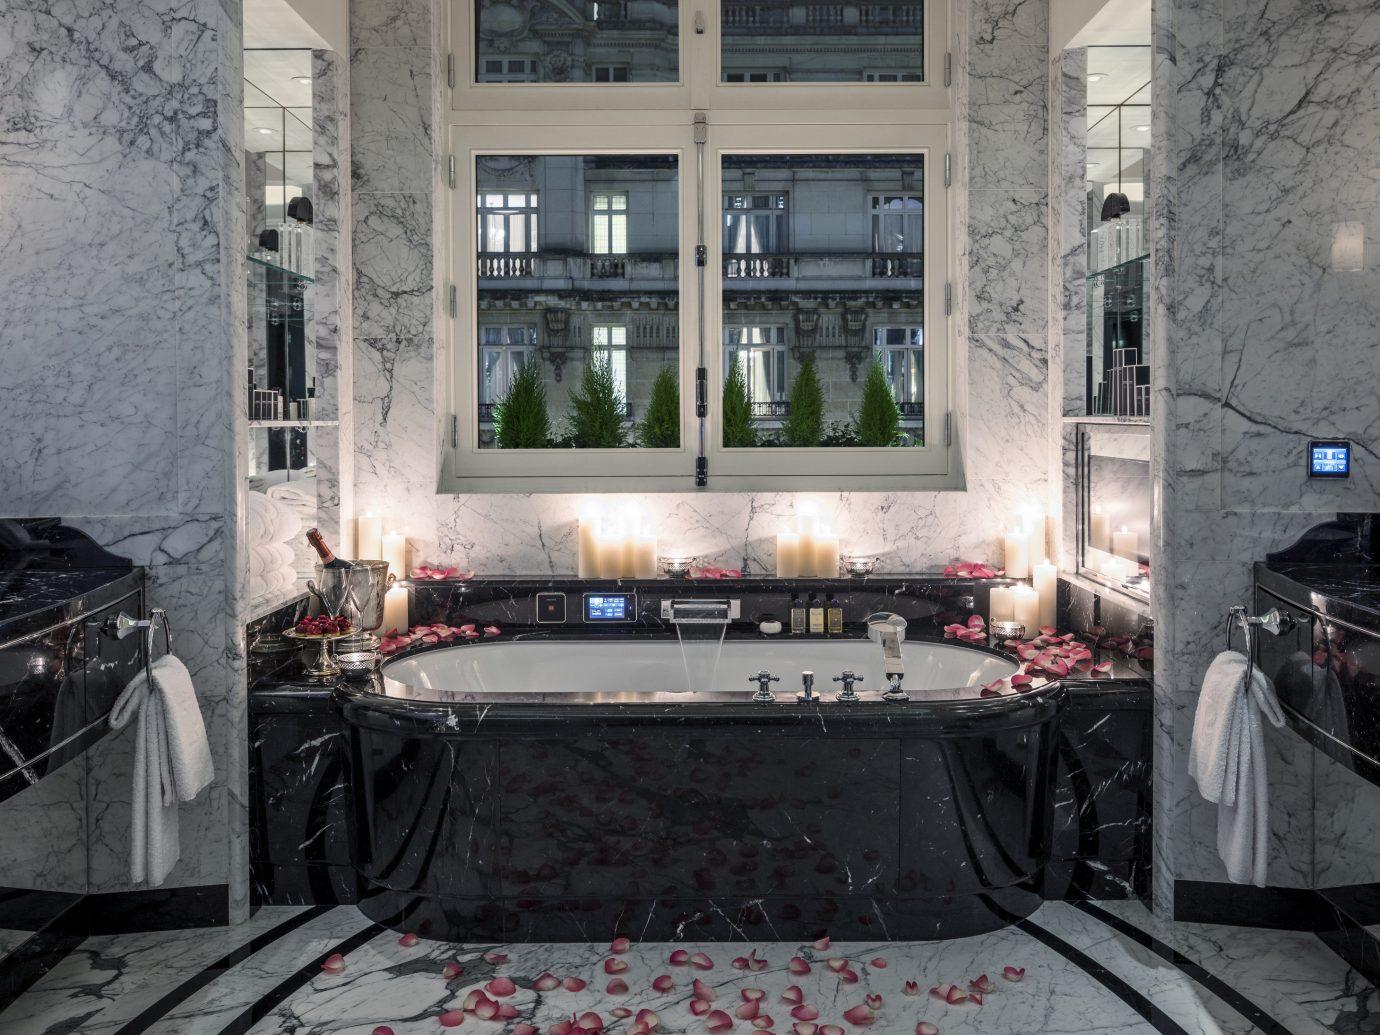 Hotels Romance window luxury vehicle building automotive exterior interior design house